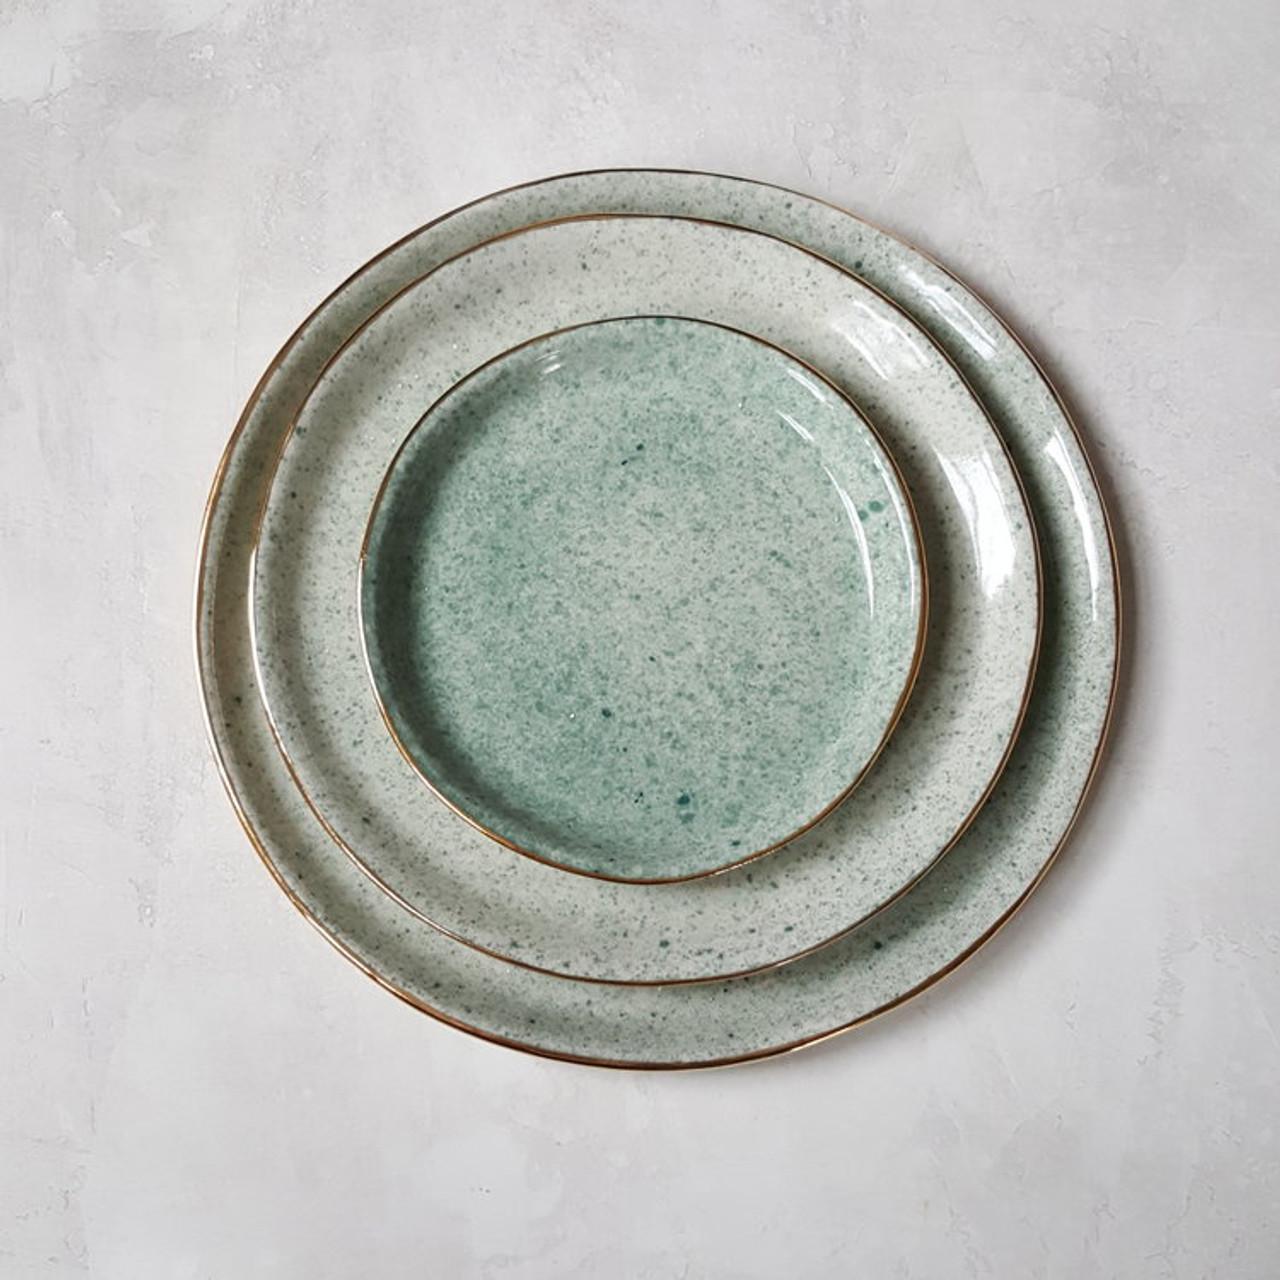 Apricity Ceramics - Dew Collection Dinnerware set (Green)